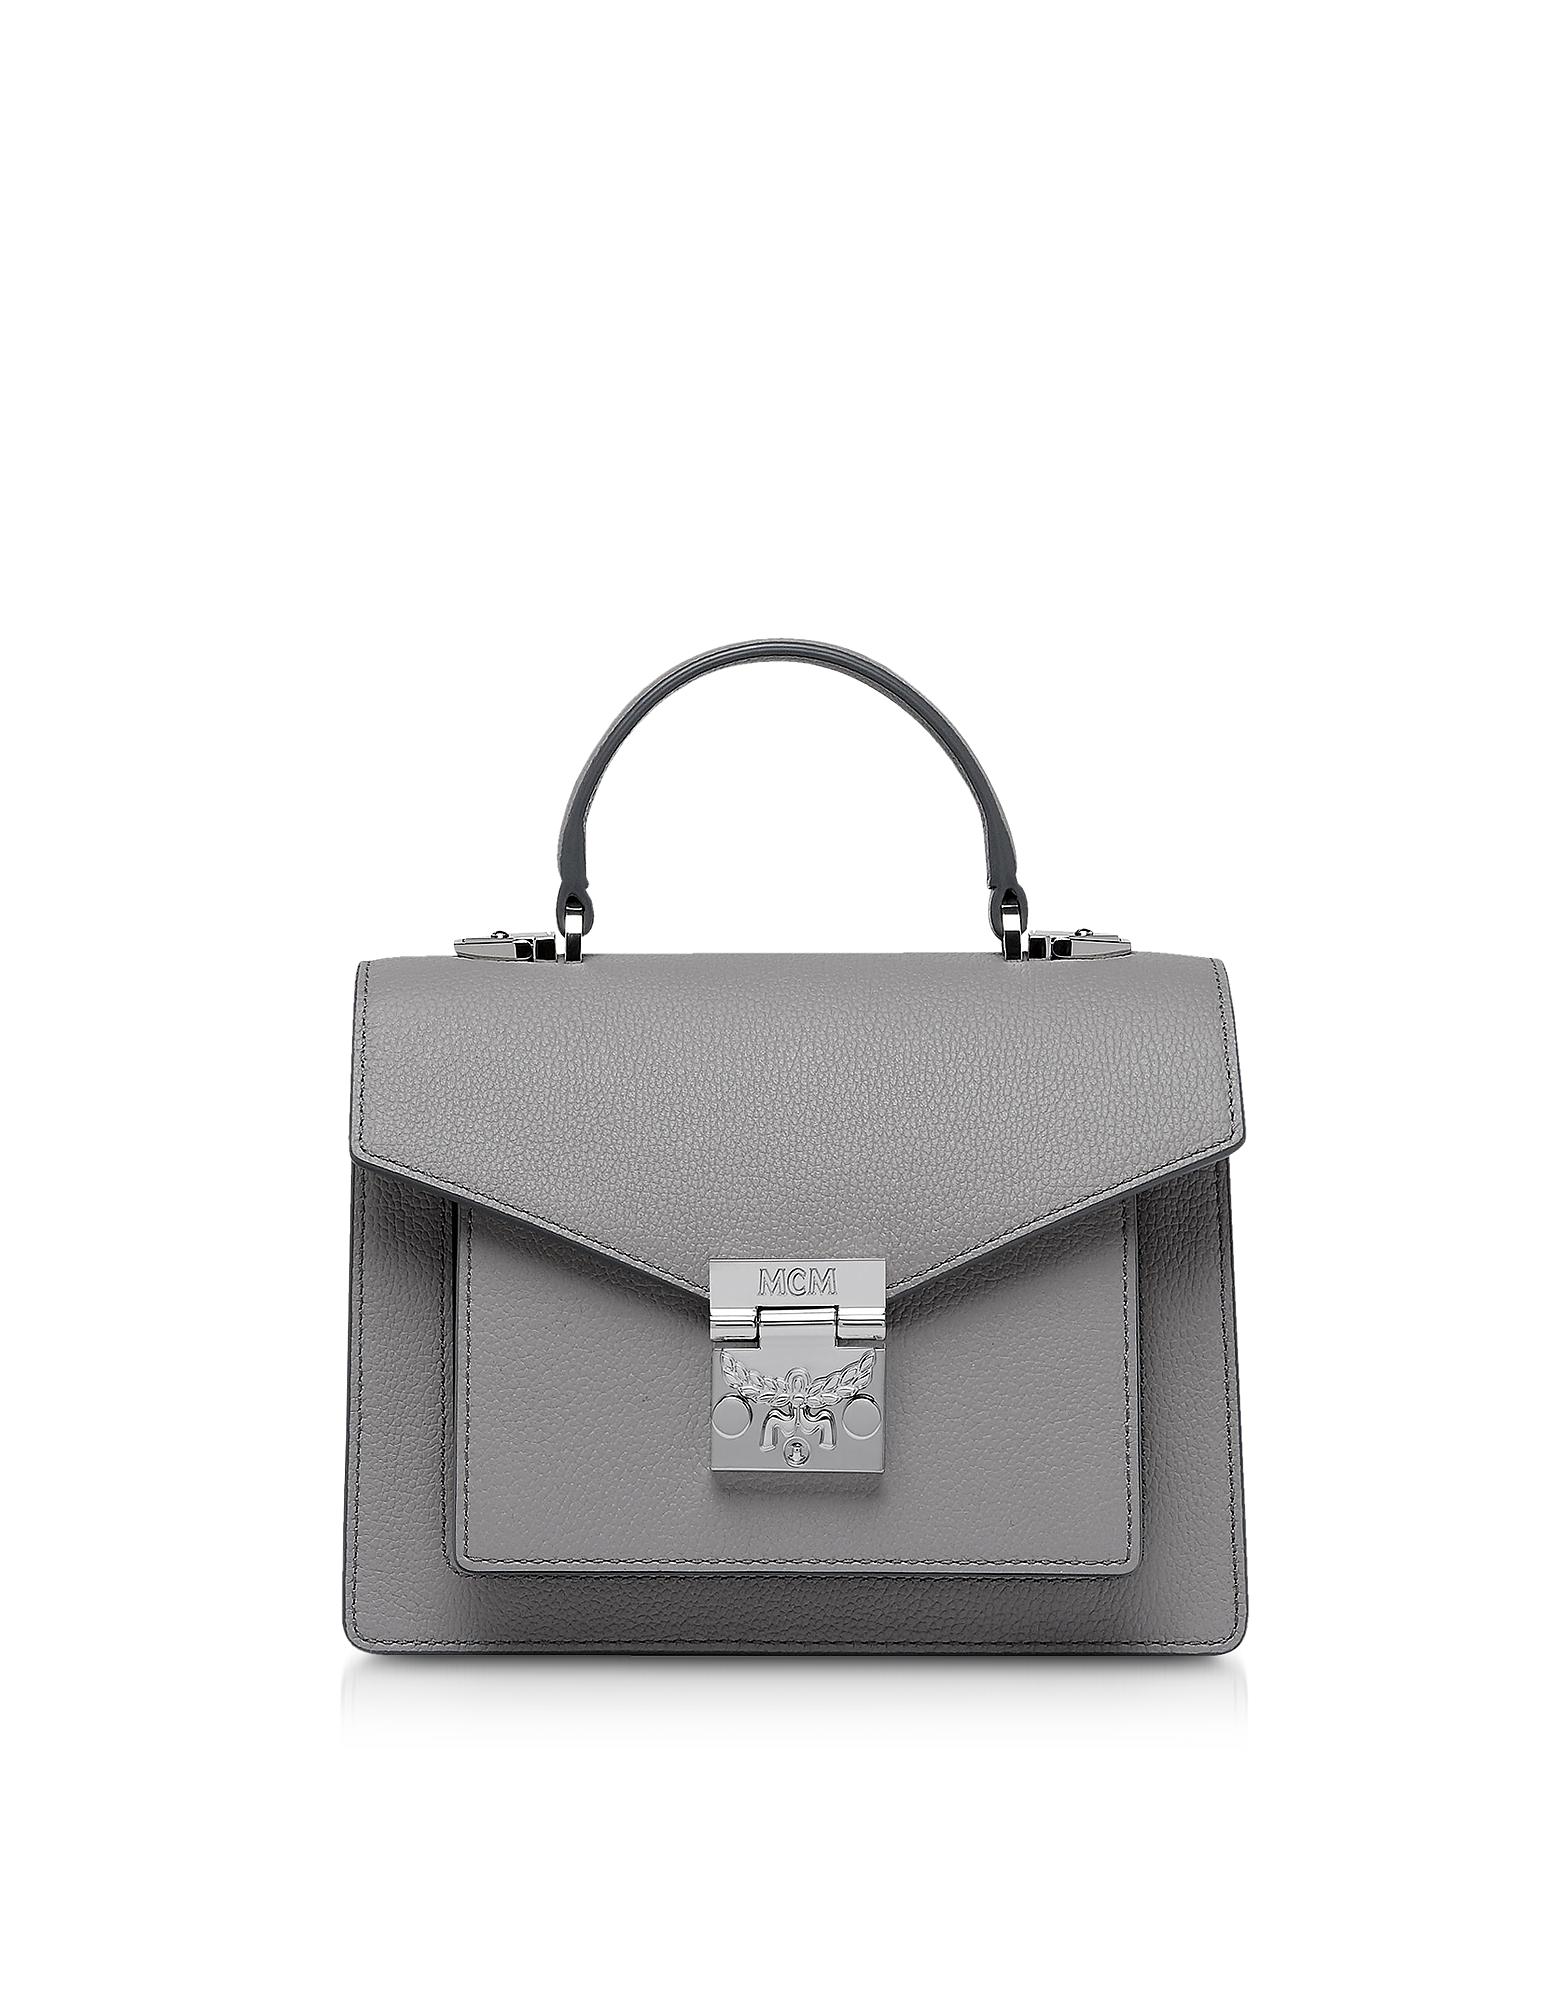 MCM Handbags, Patricia Park Avenue Small Satchel Bag